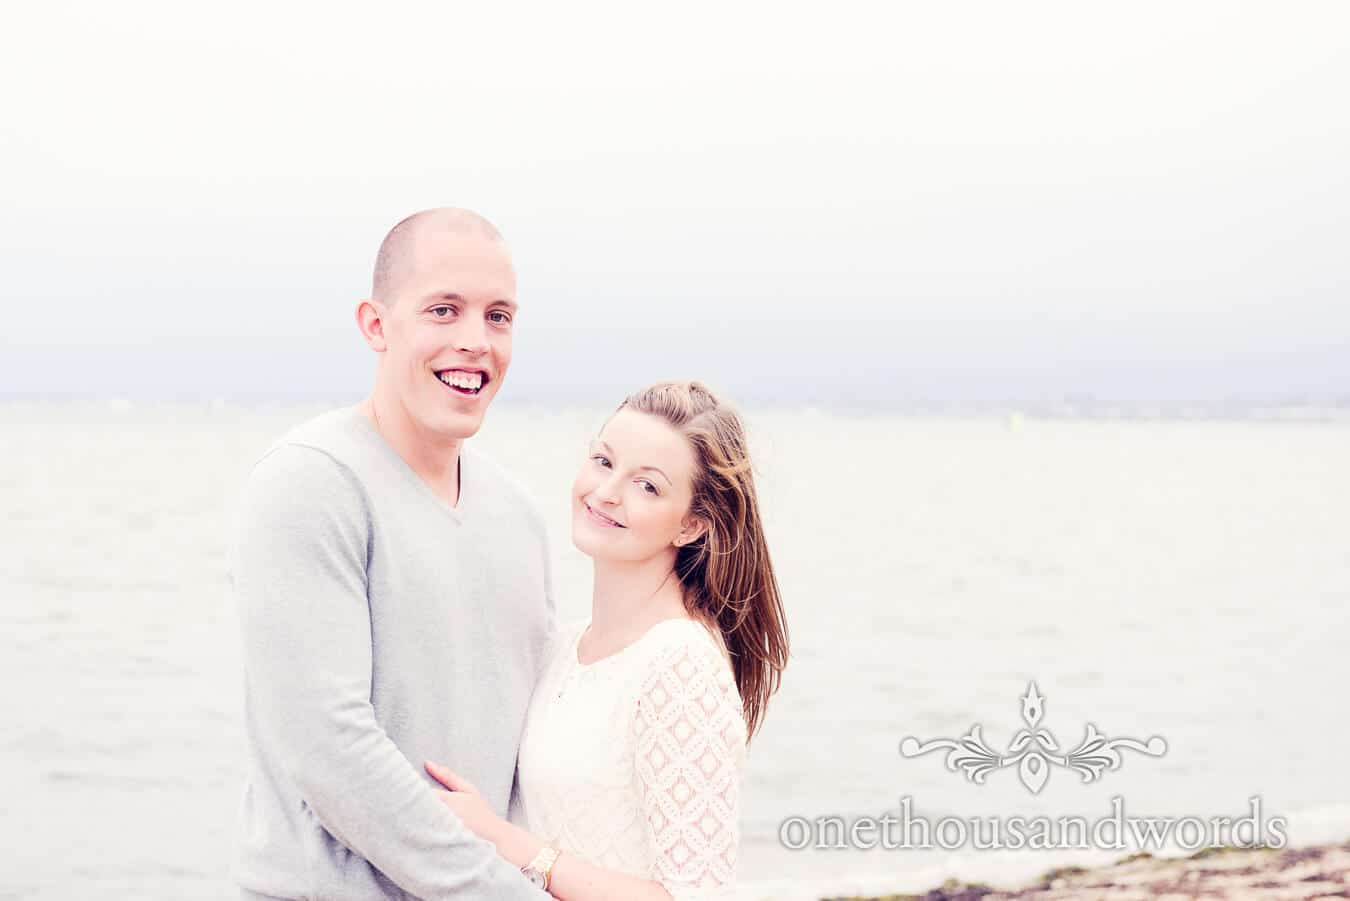 Sandbanks Hotel Engagement Photograph of happy couple